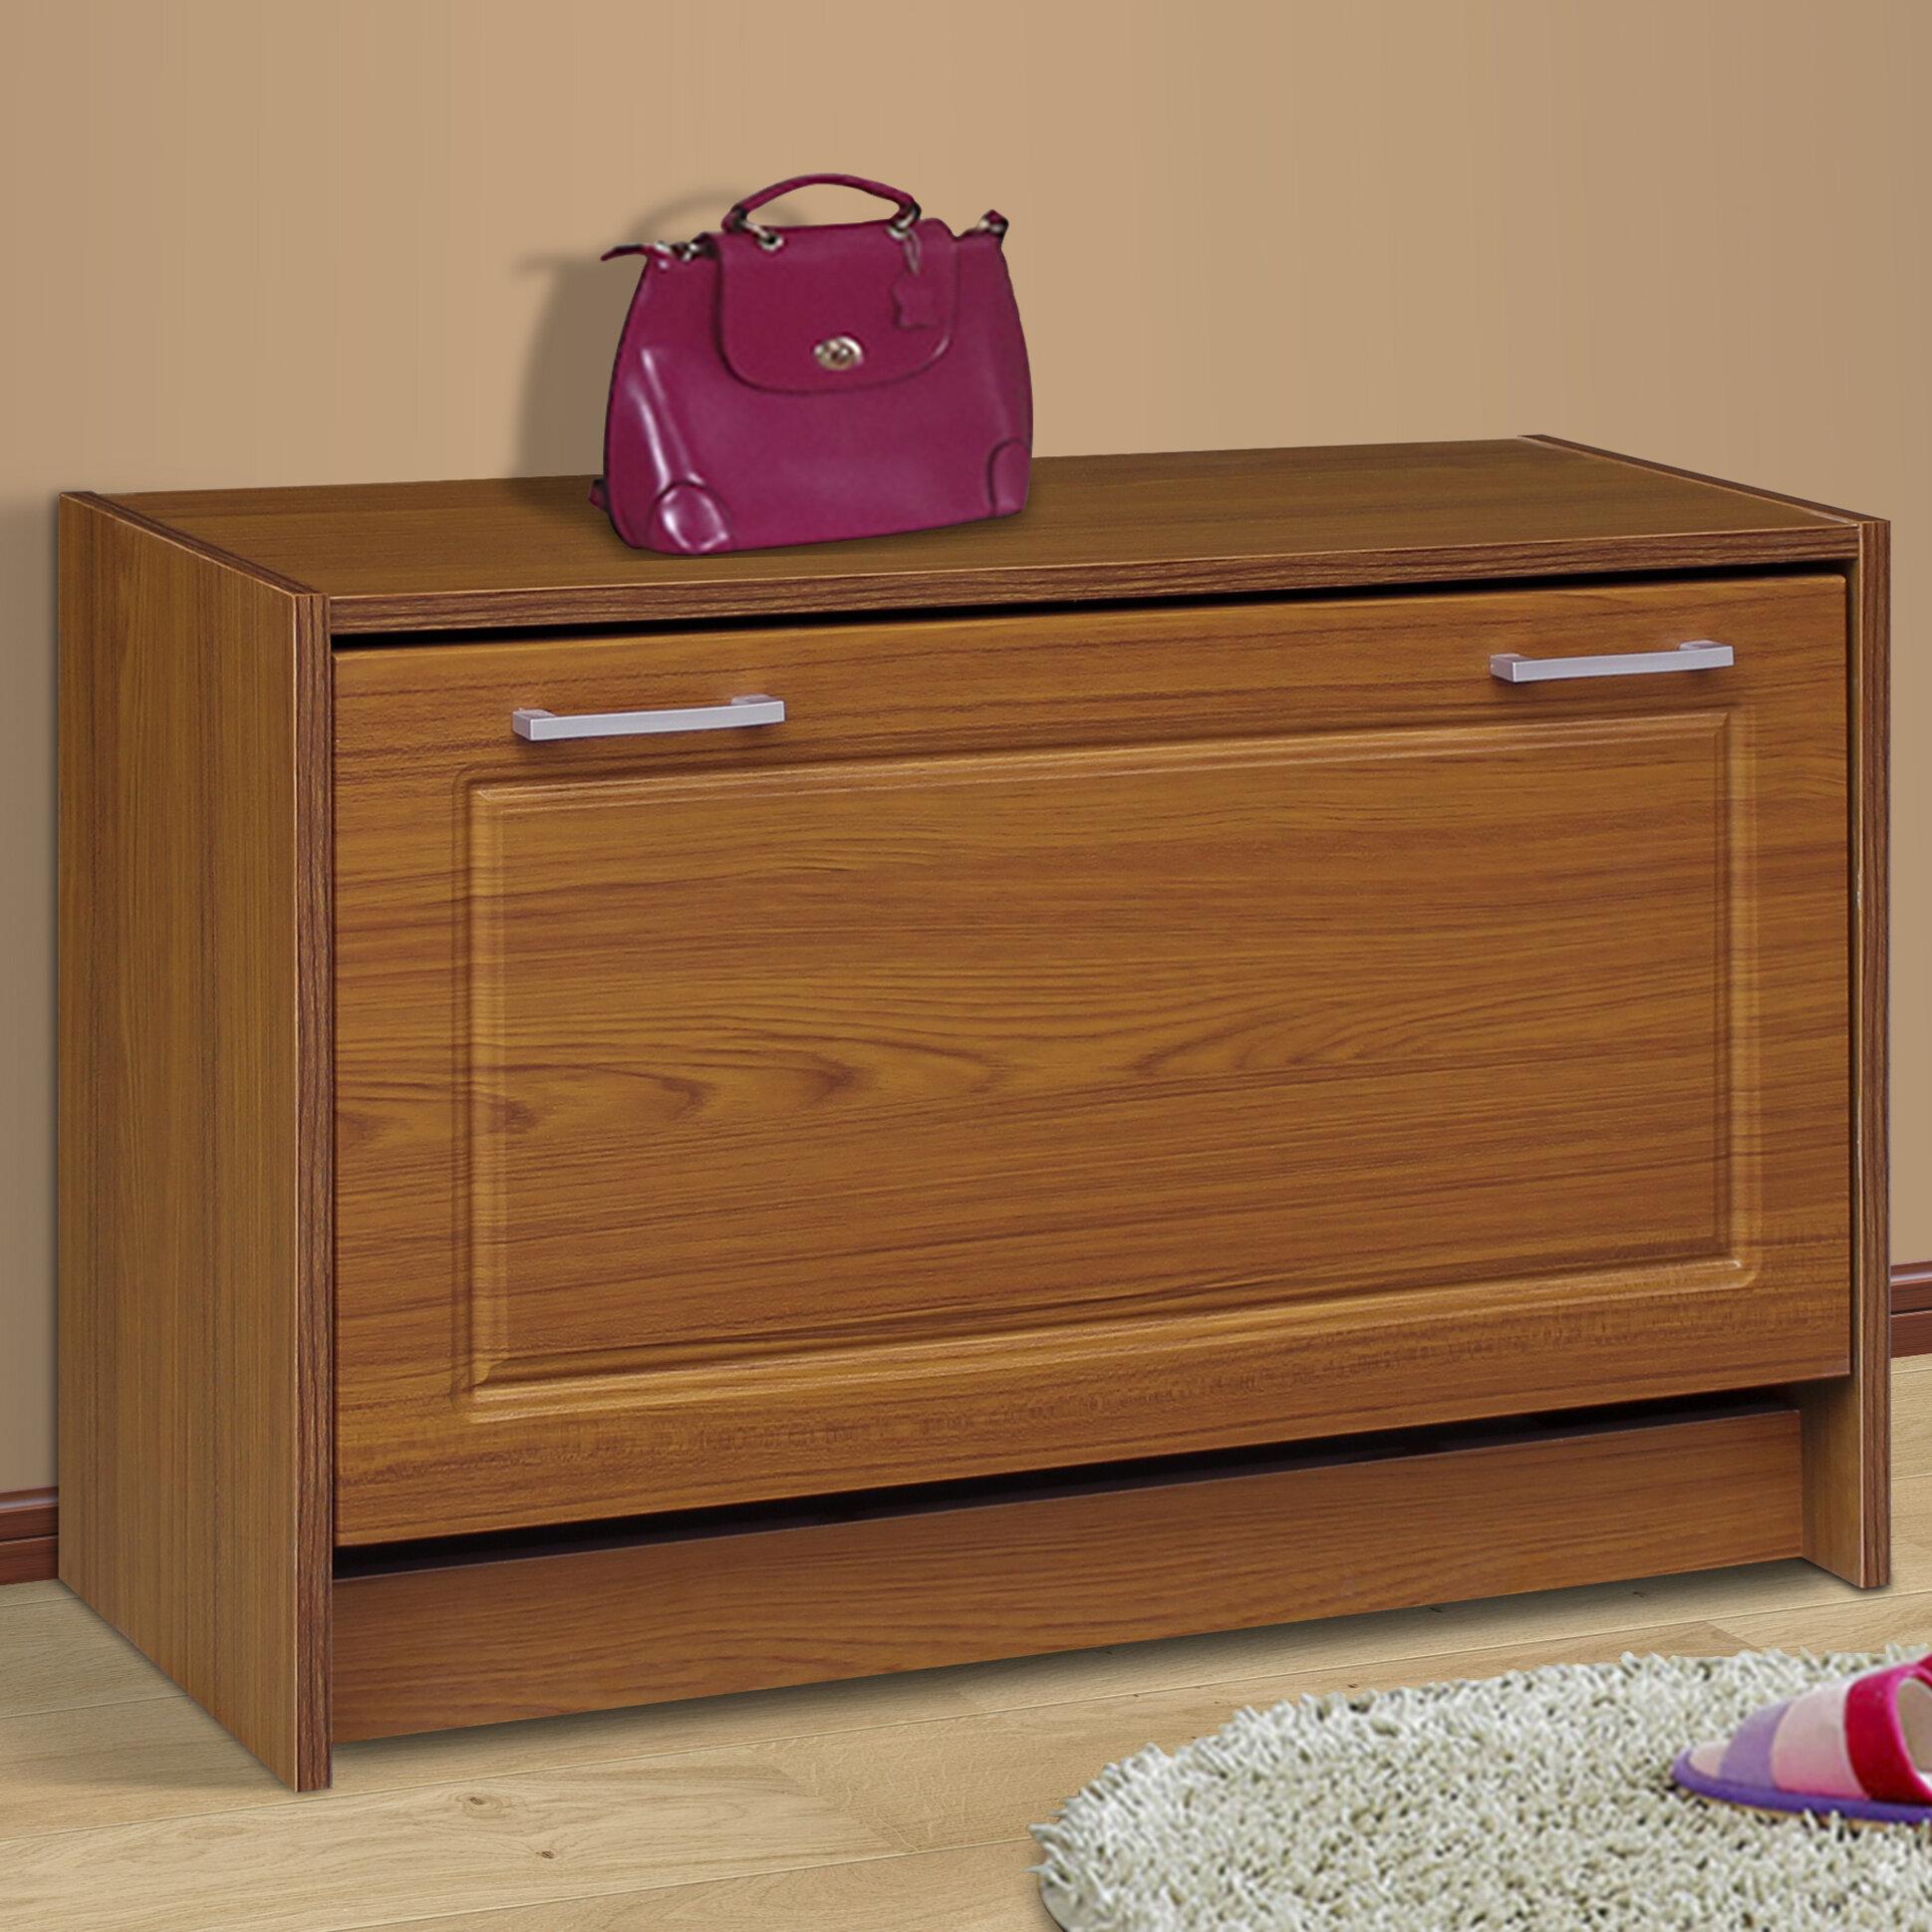 4d concepts single 12 pair shoe storage cabinet ebay - Shoe cabinet for small spaces concept ...